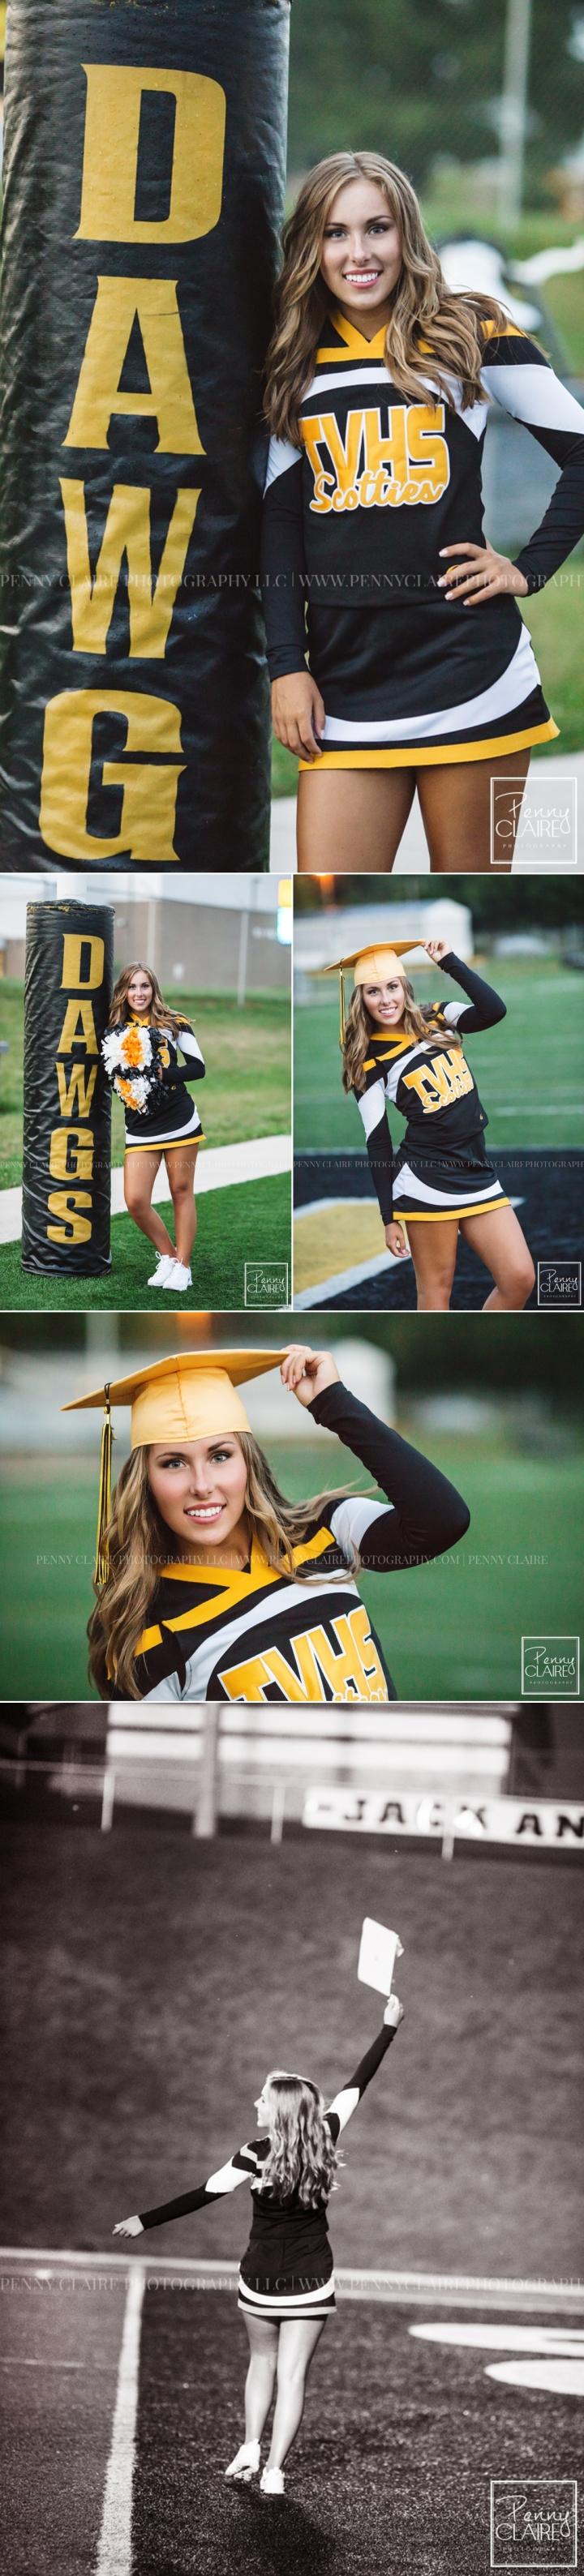 high-school-senior-photos-pennyclaire-9